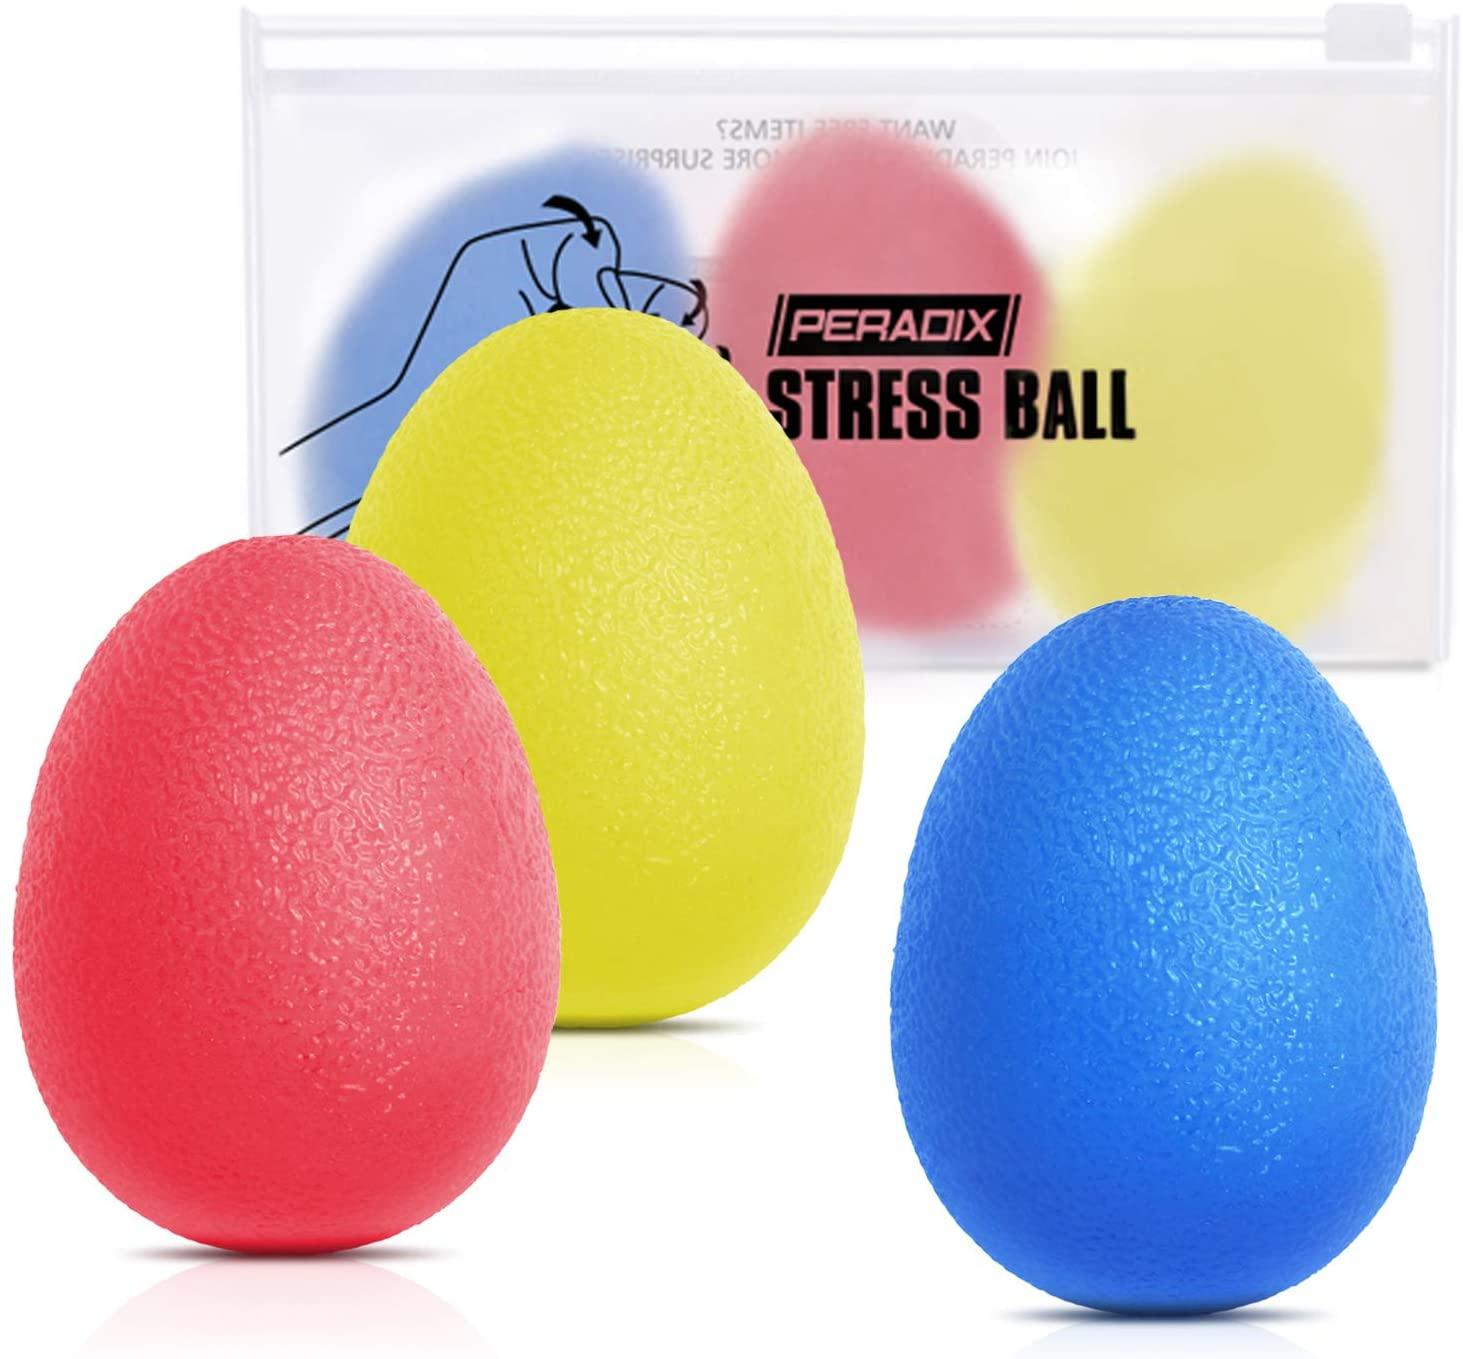 Juego de pelotas anti estrés